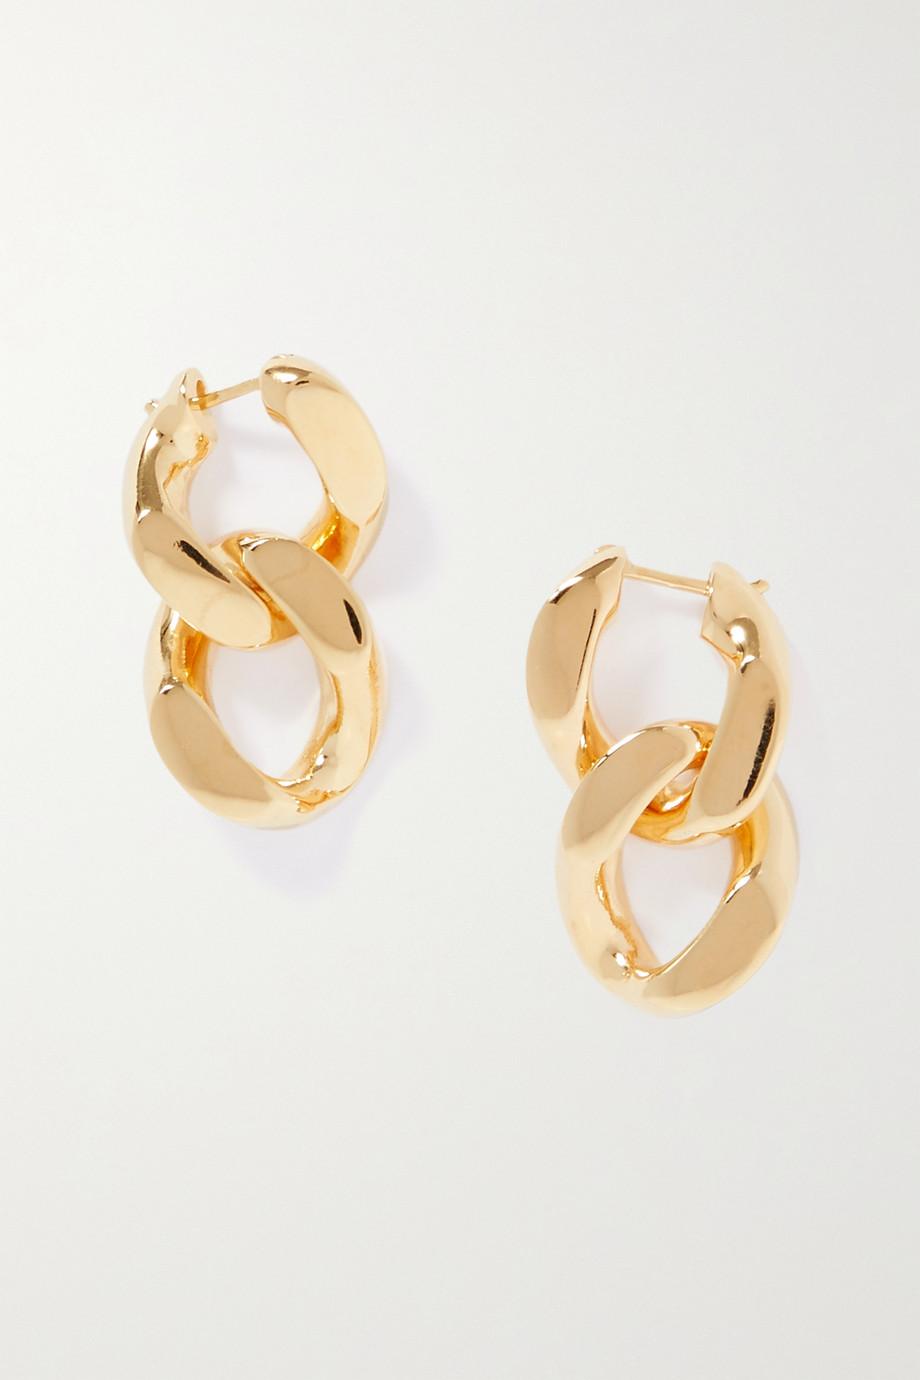 Bottega Veneta Gold-tone silver earrings